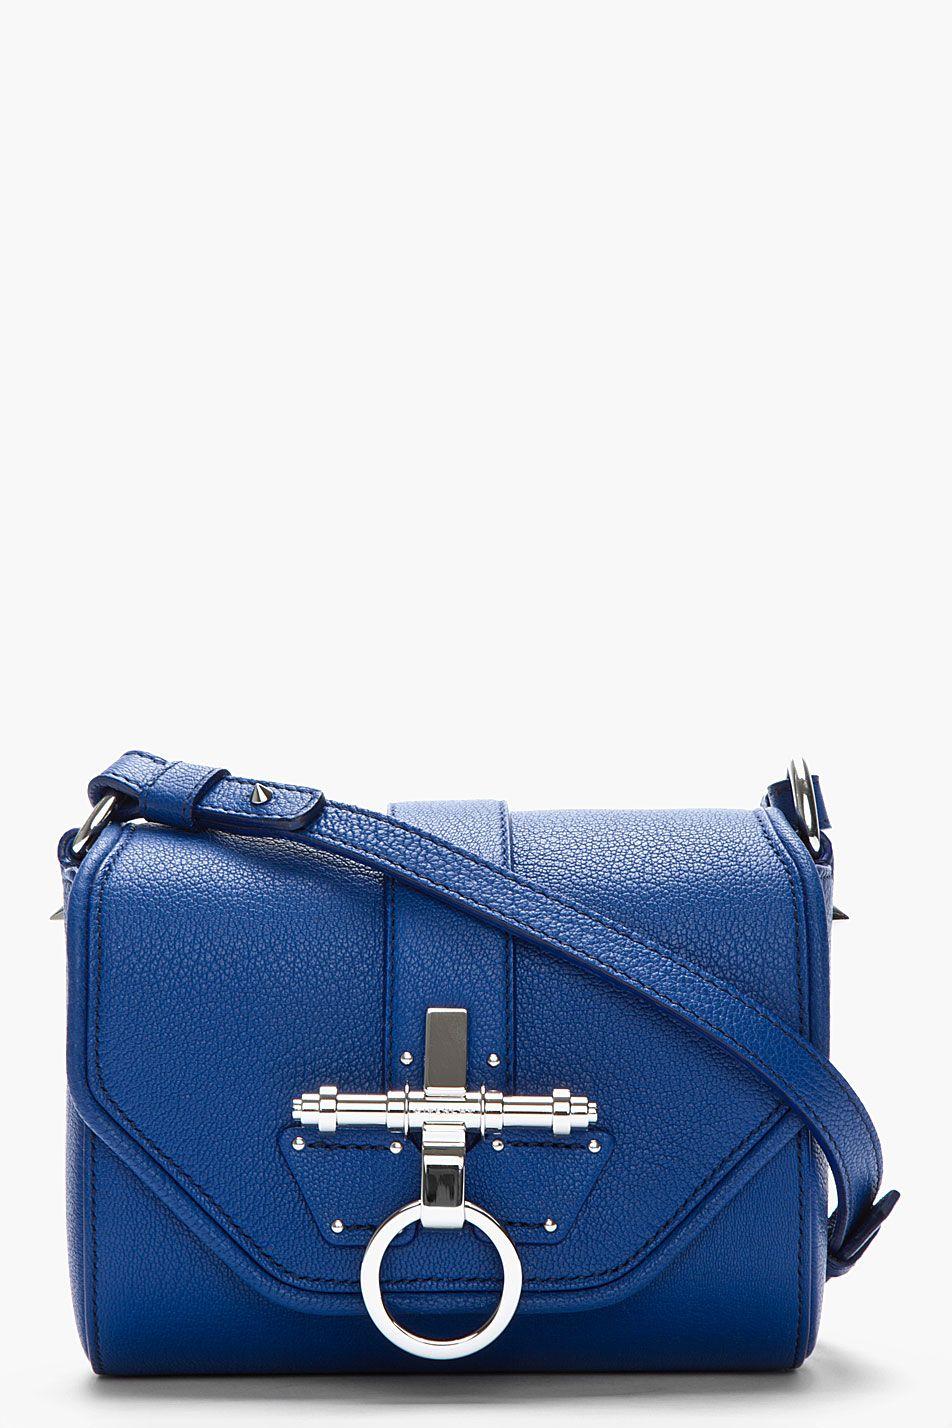 0b3ae54546 GIVENCHY Royal Blue Leather Obsedia Shoulder BAg